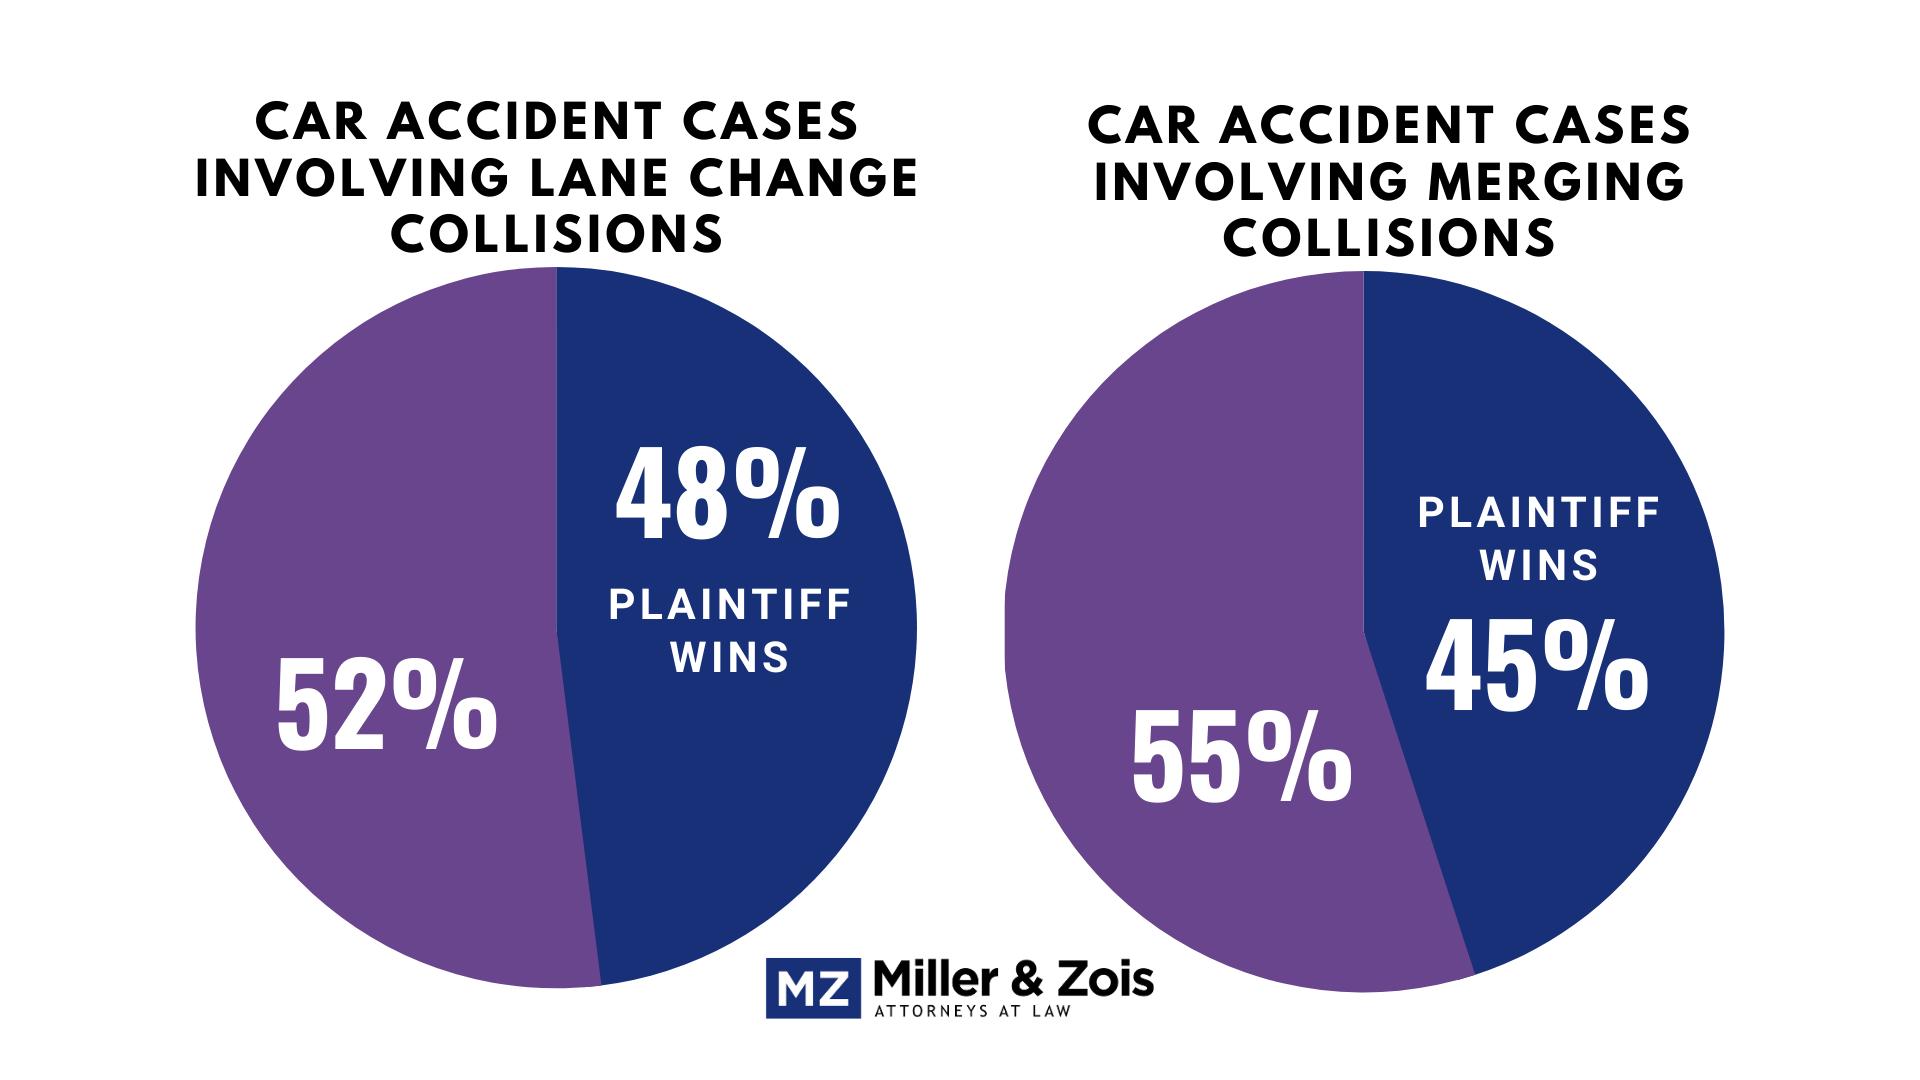 lane change accidents